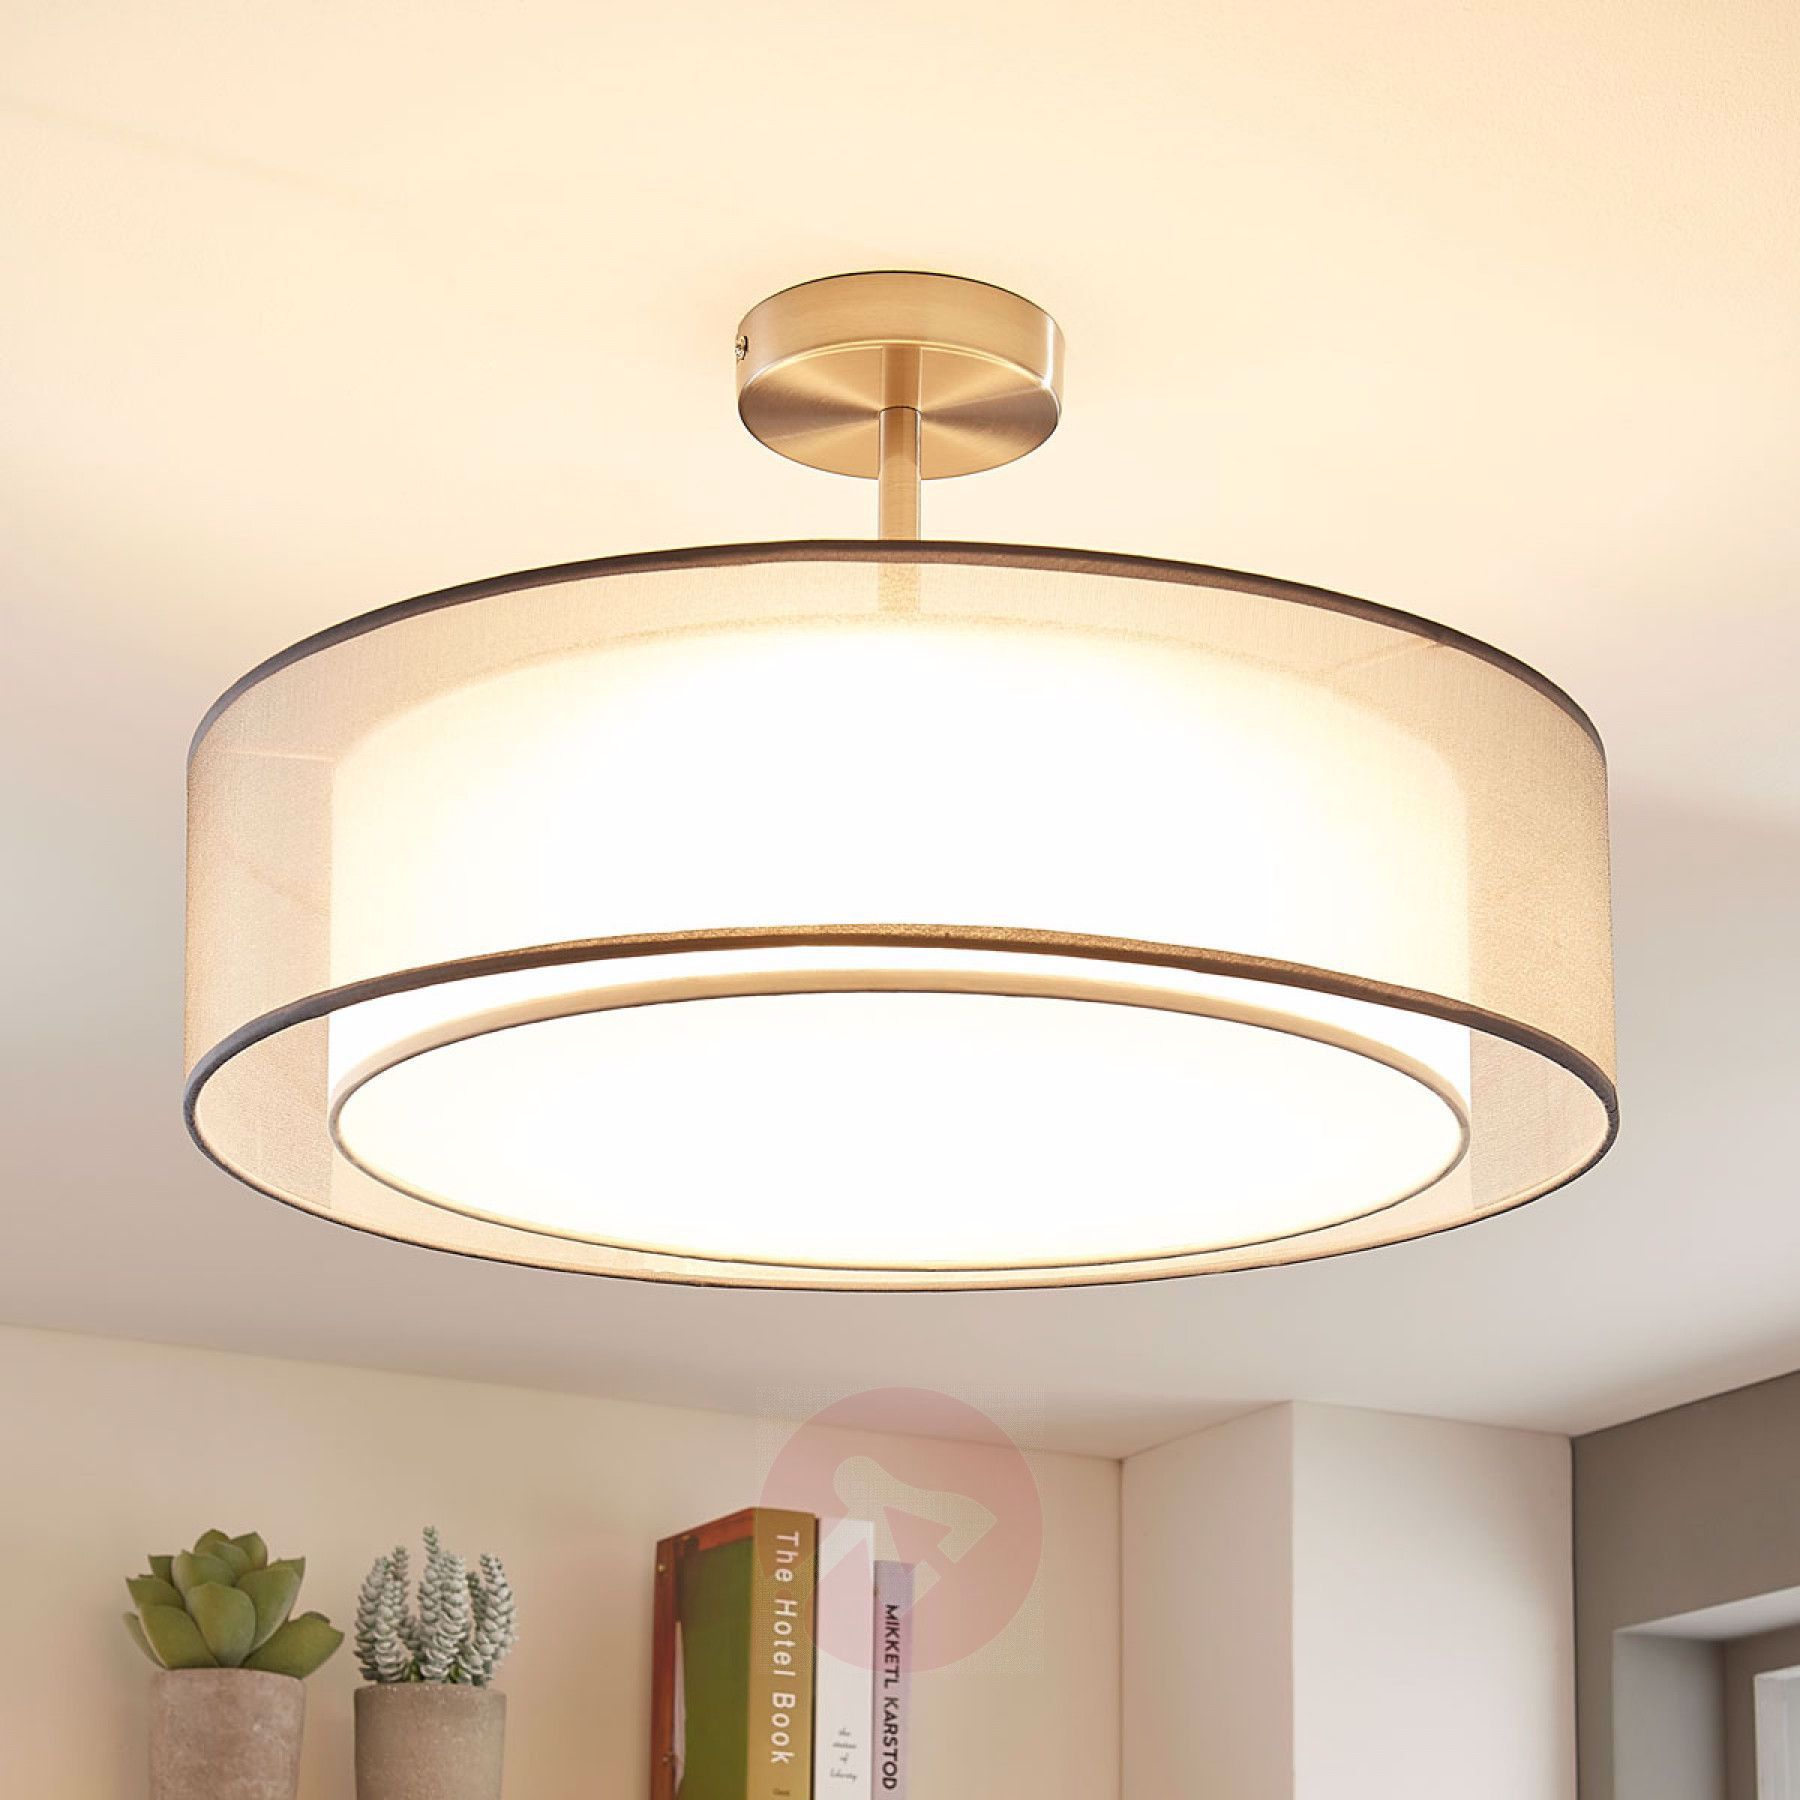 LED Deckenlampe Pikka, 3 stufig dimmbar, grau 9621773 01 ...